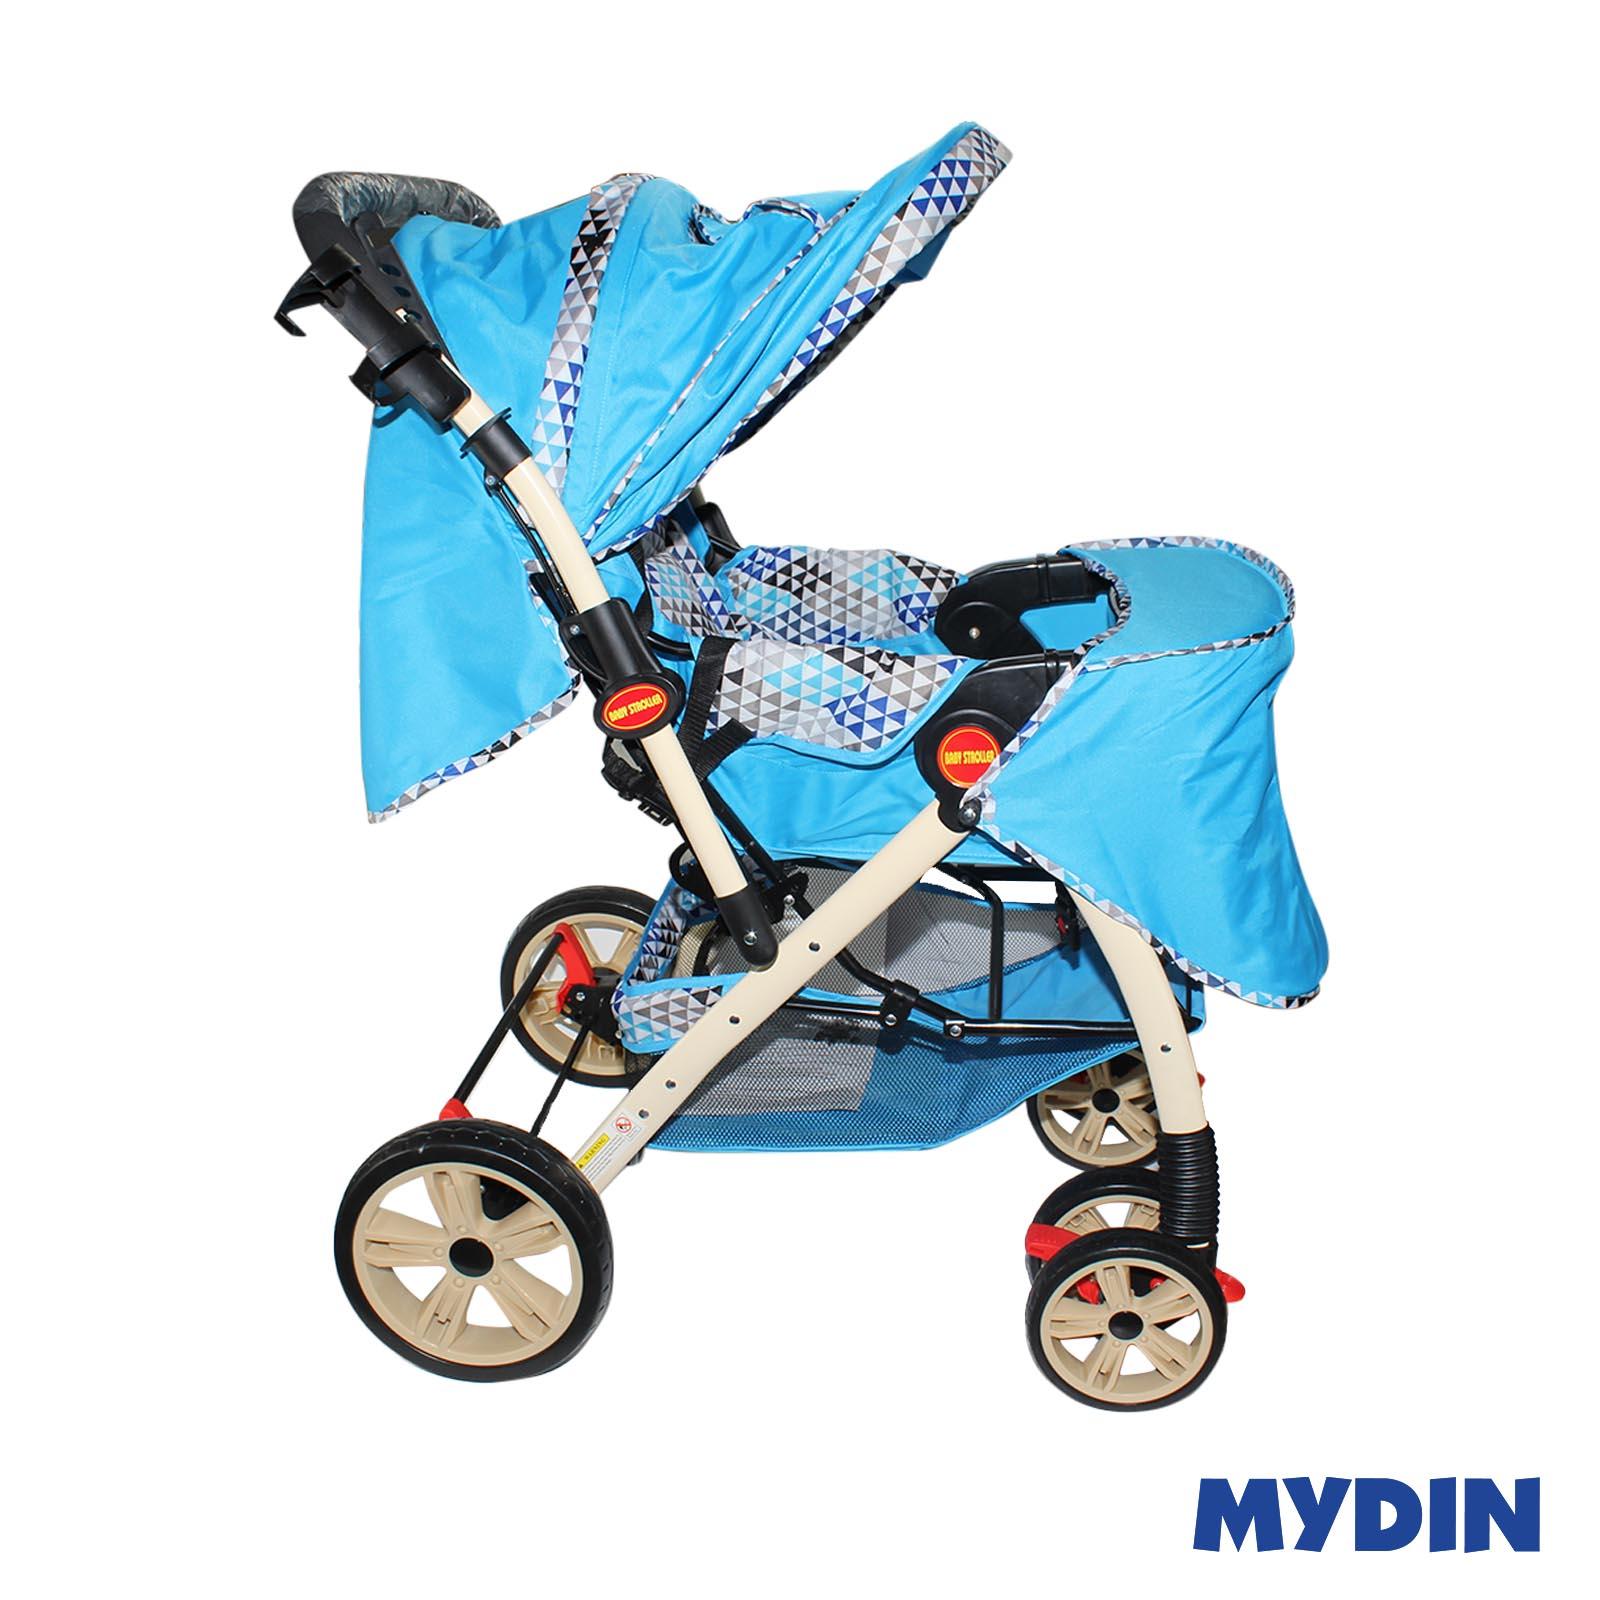 MYBB Baby Stroller Blue 0518FLSBP05B